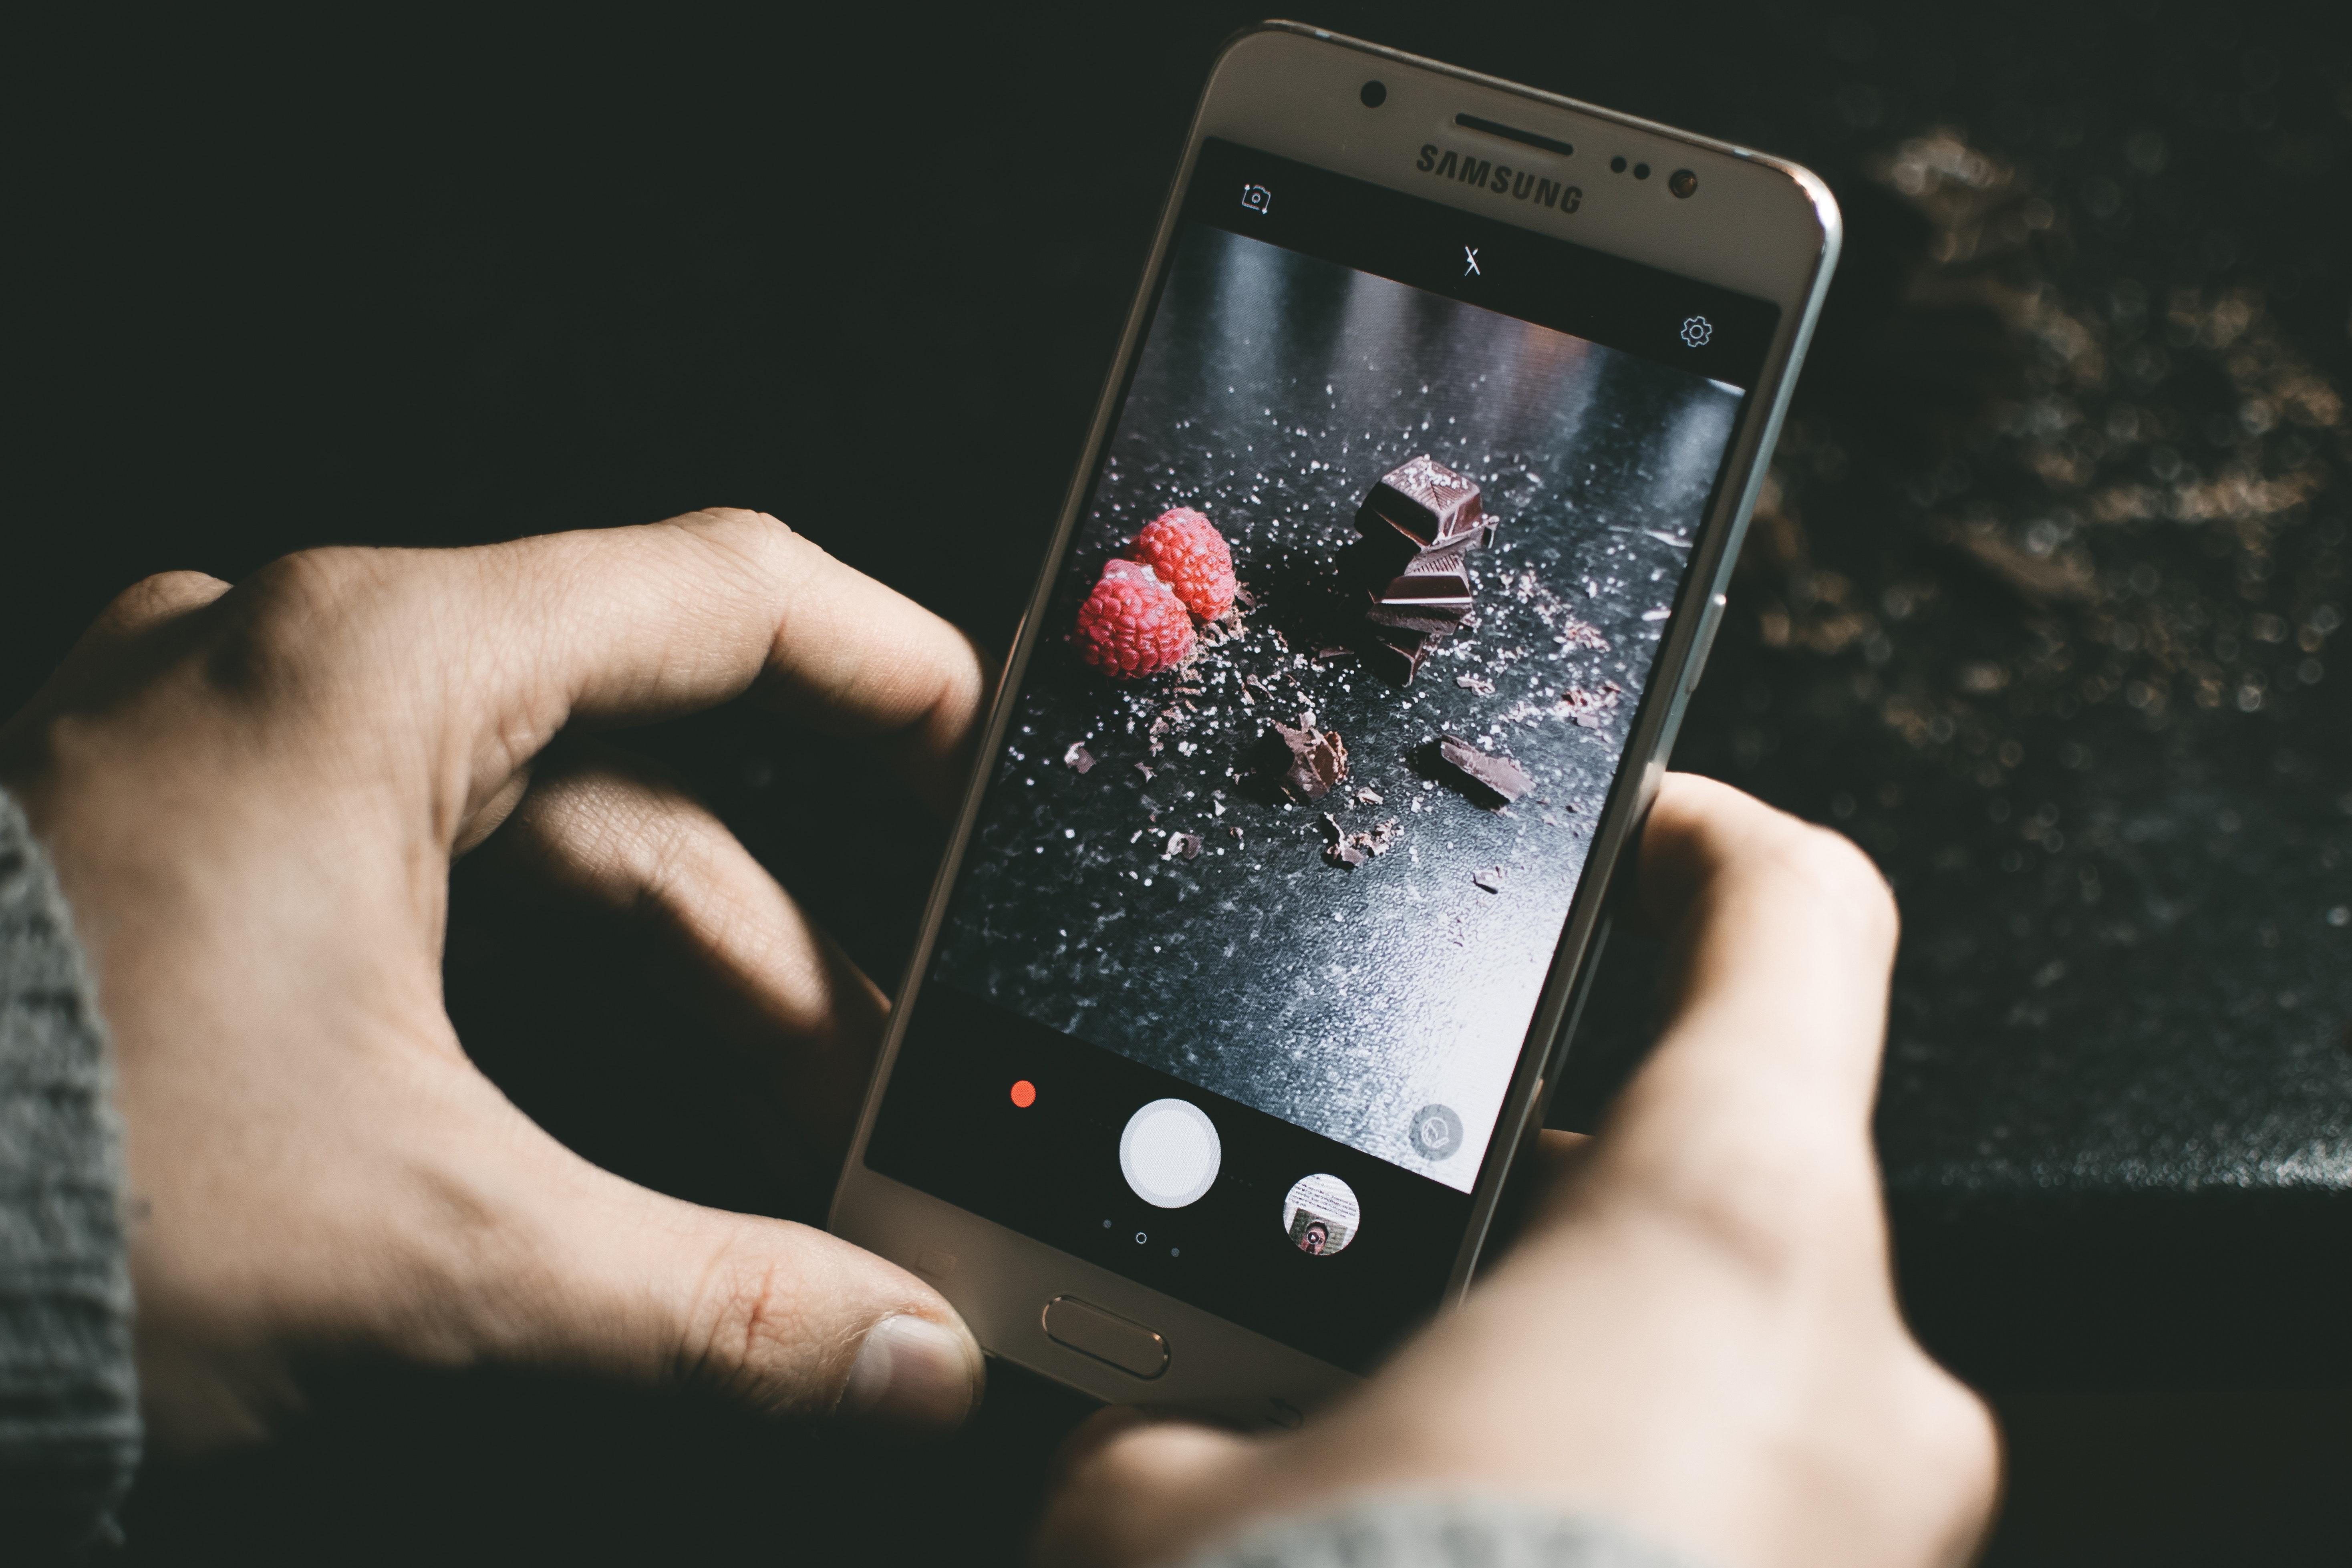 Gray samsung smartphone showing chocolates photo